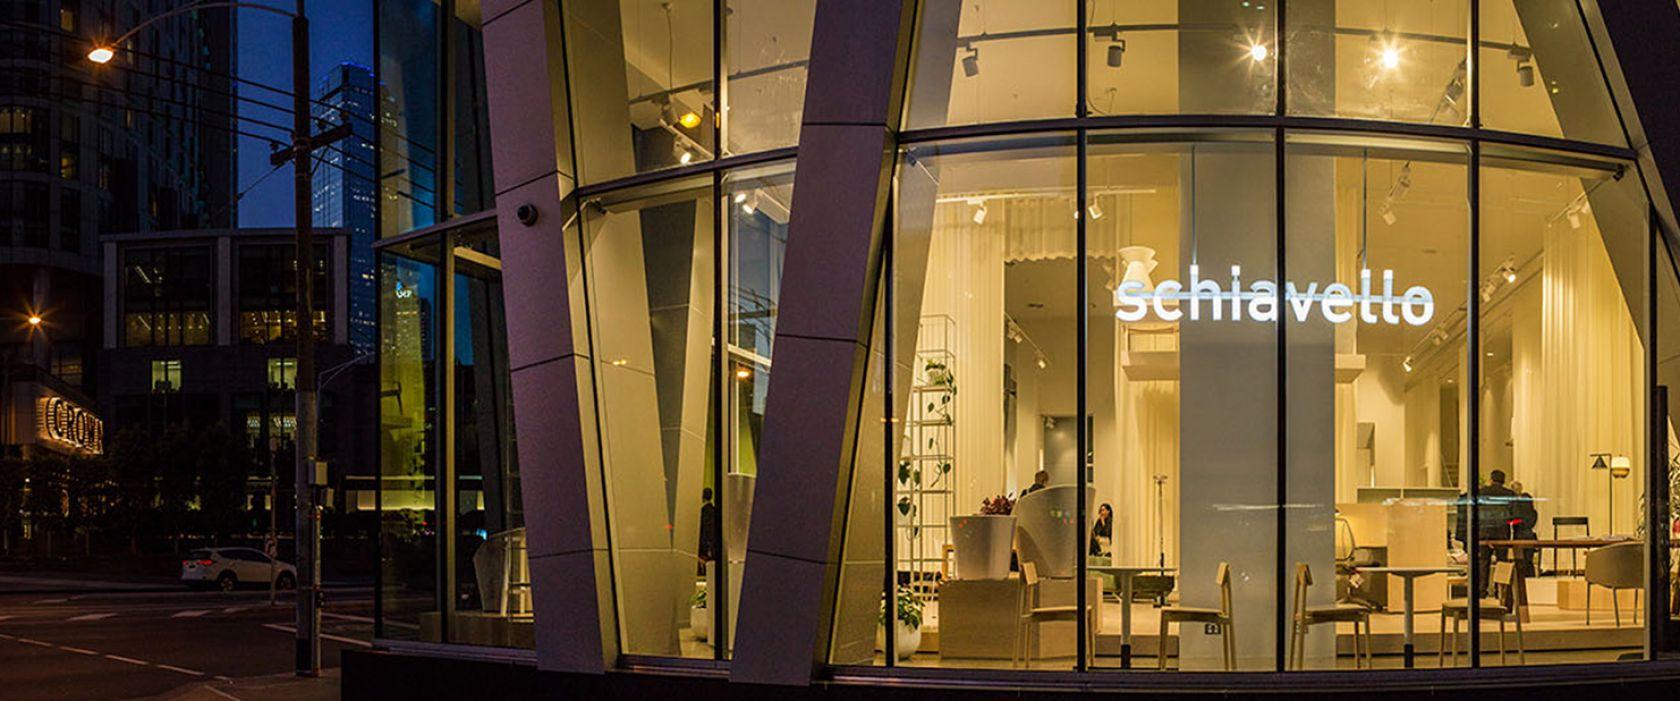 schiavello showroom location sign window